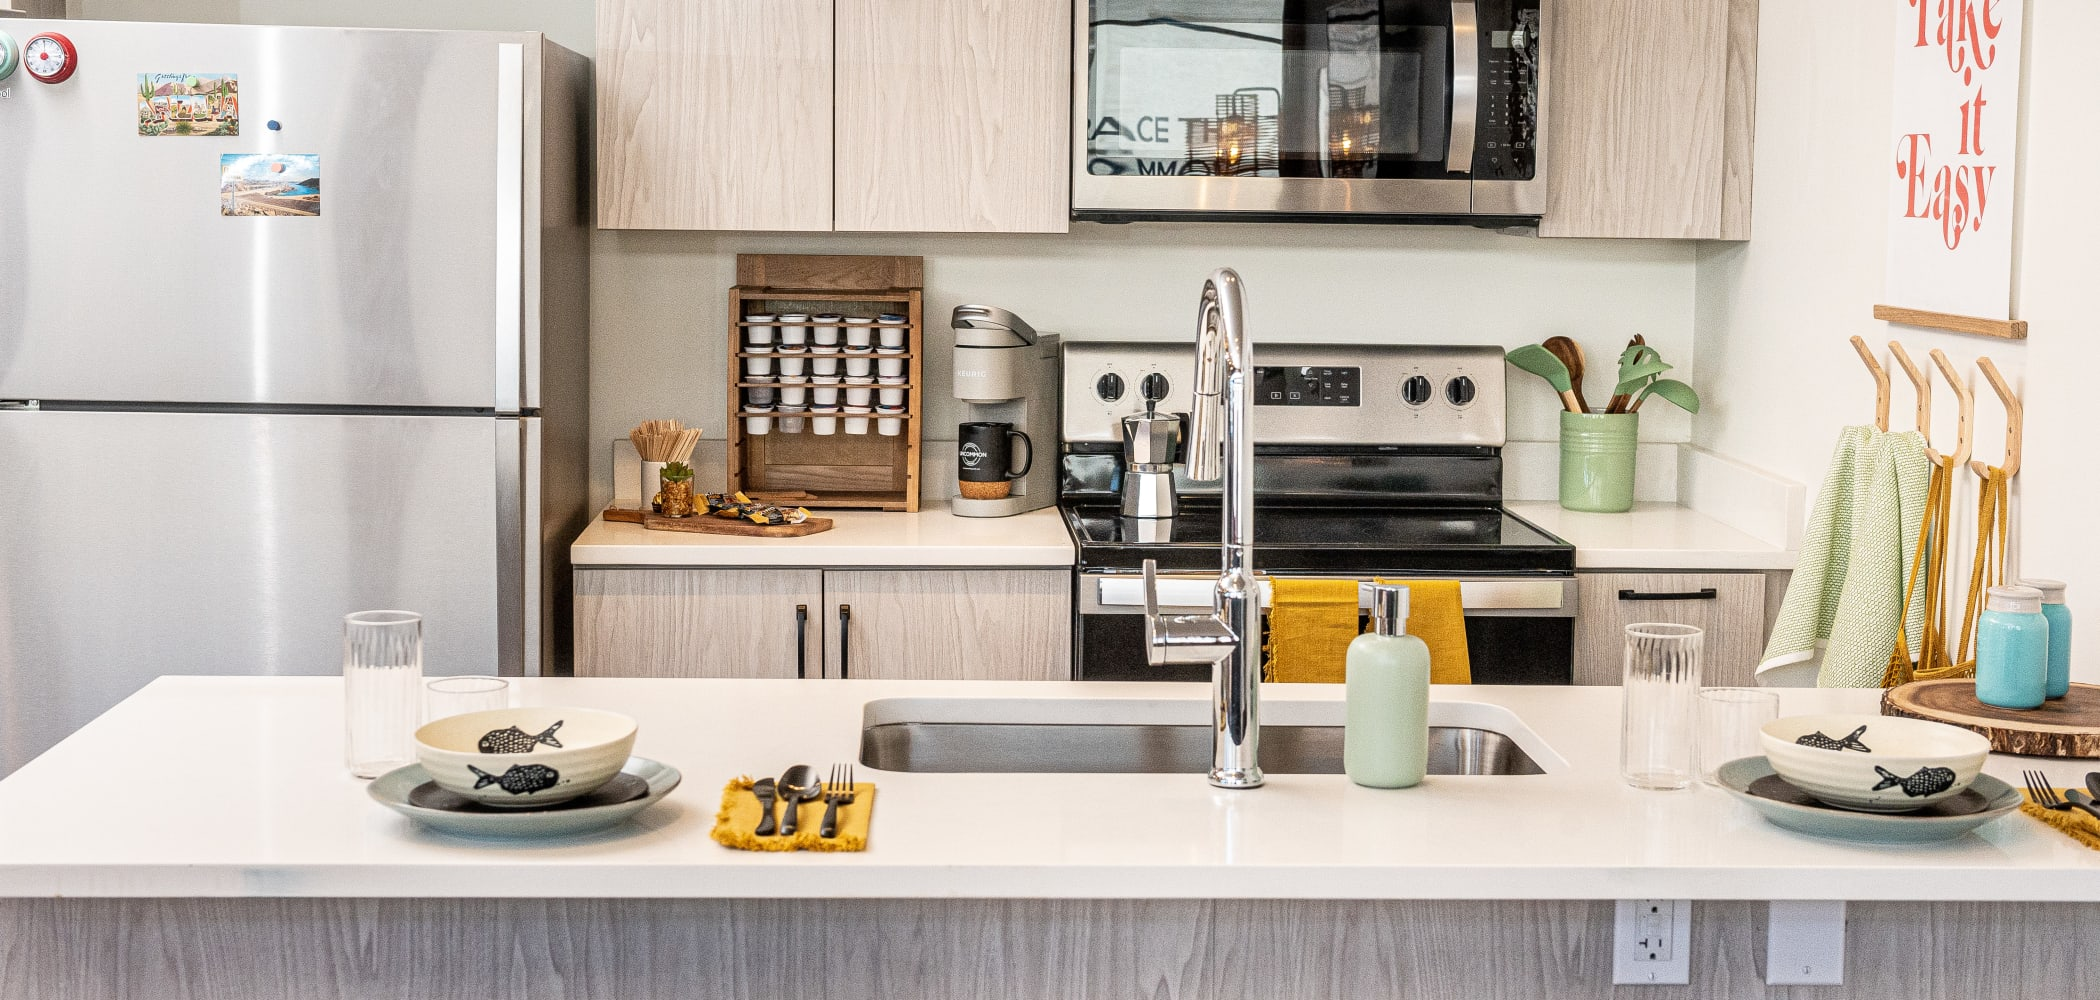 Modern Kitchen at UNCOMMON Flagstaff in Flagstaff, AZ